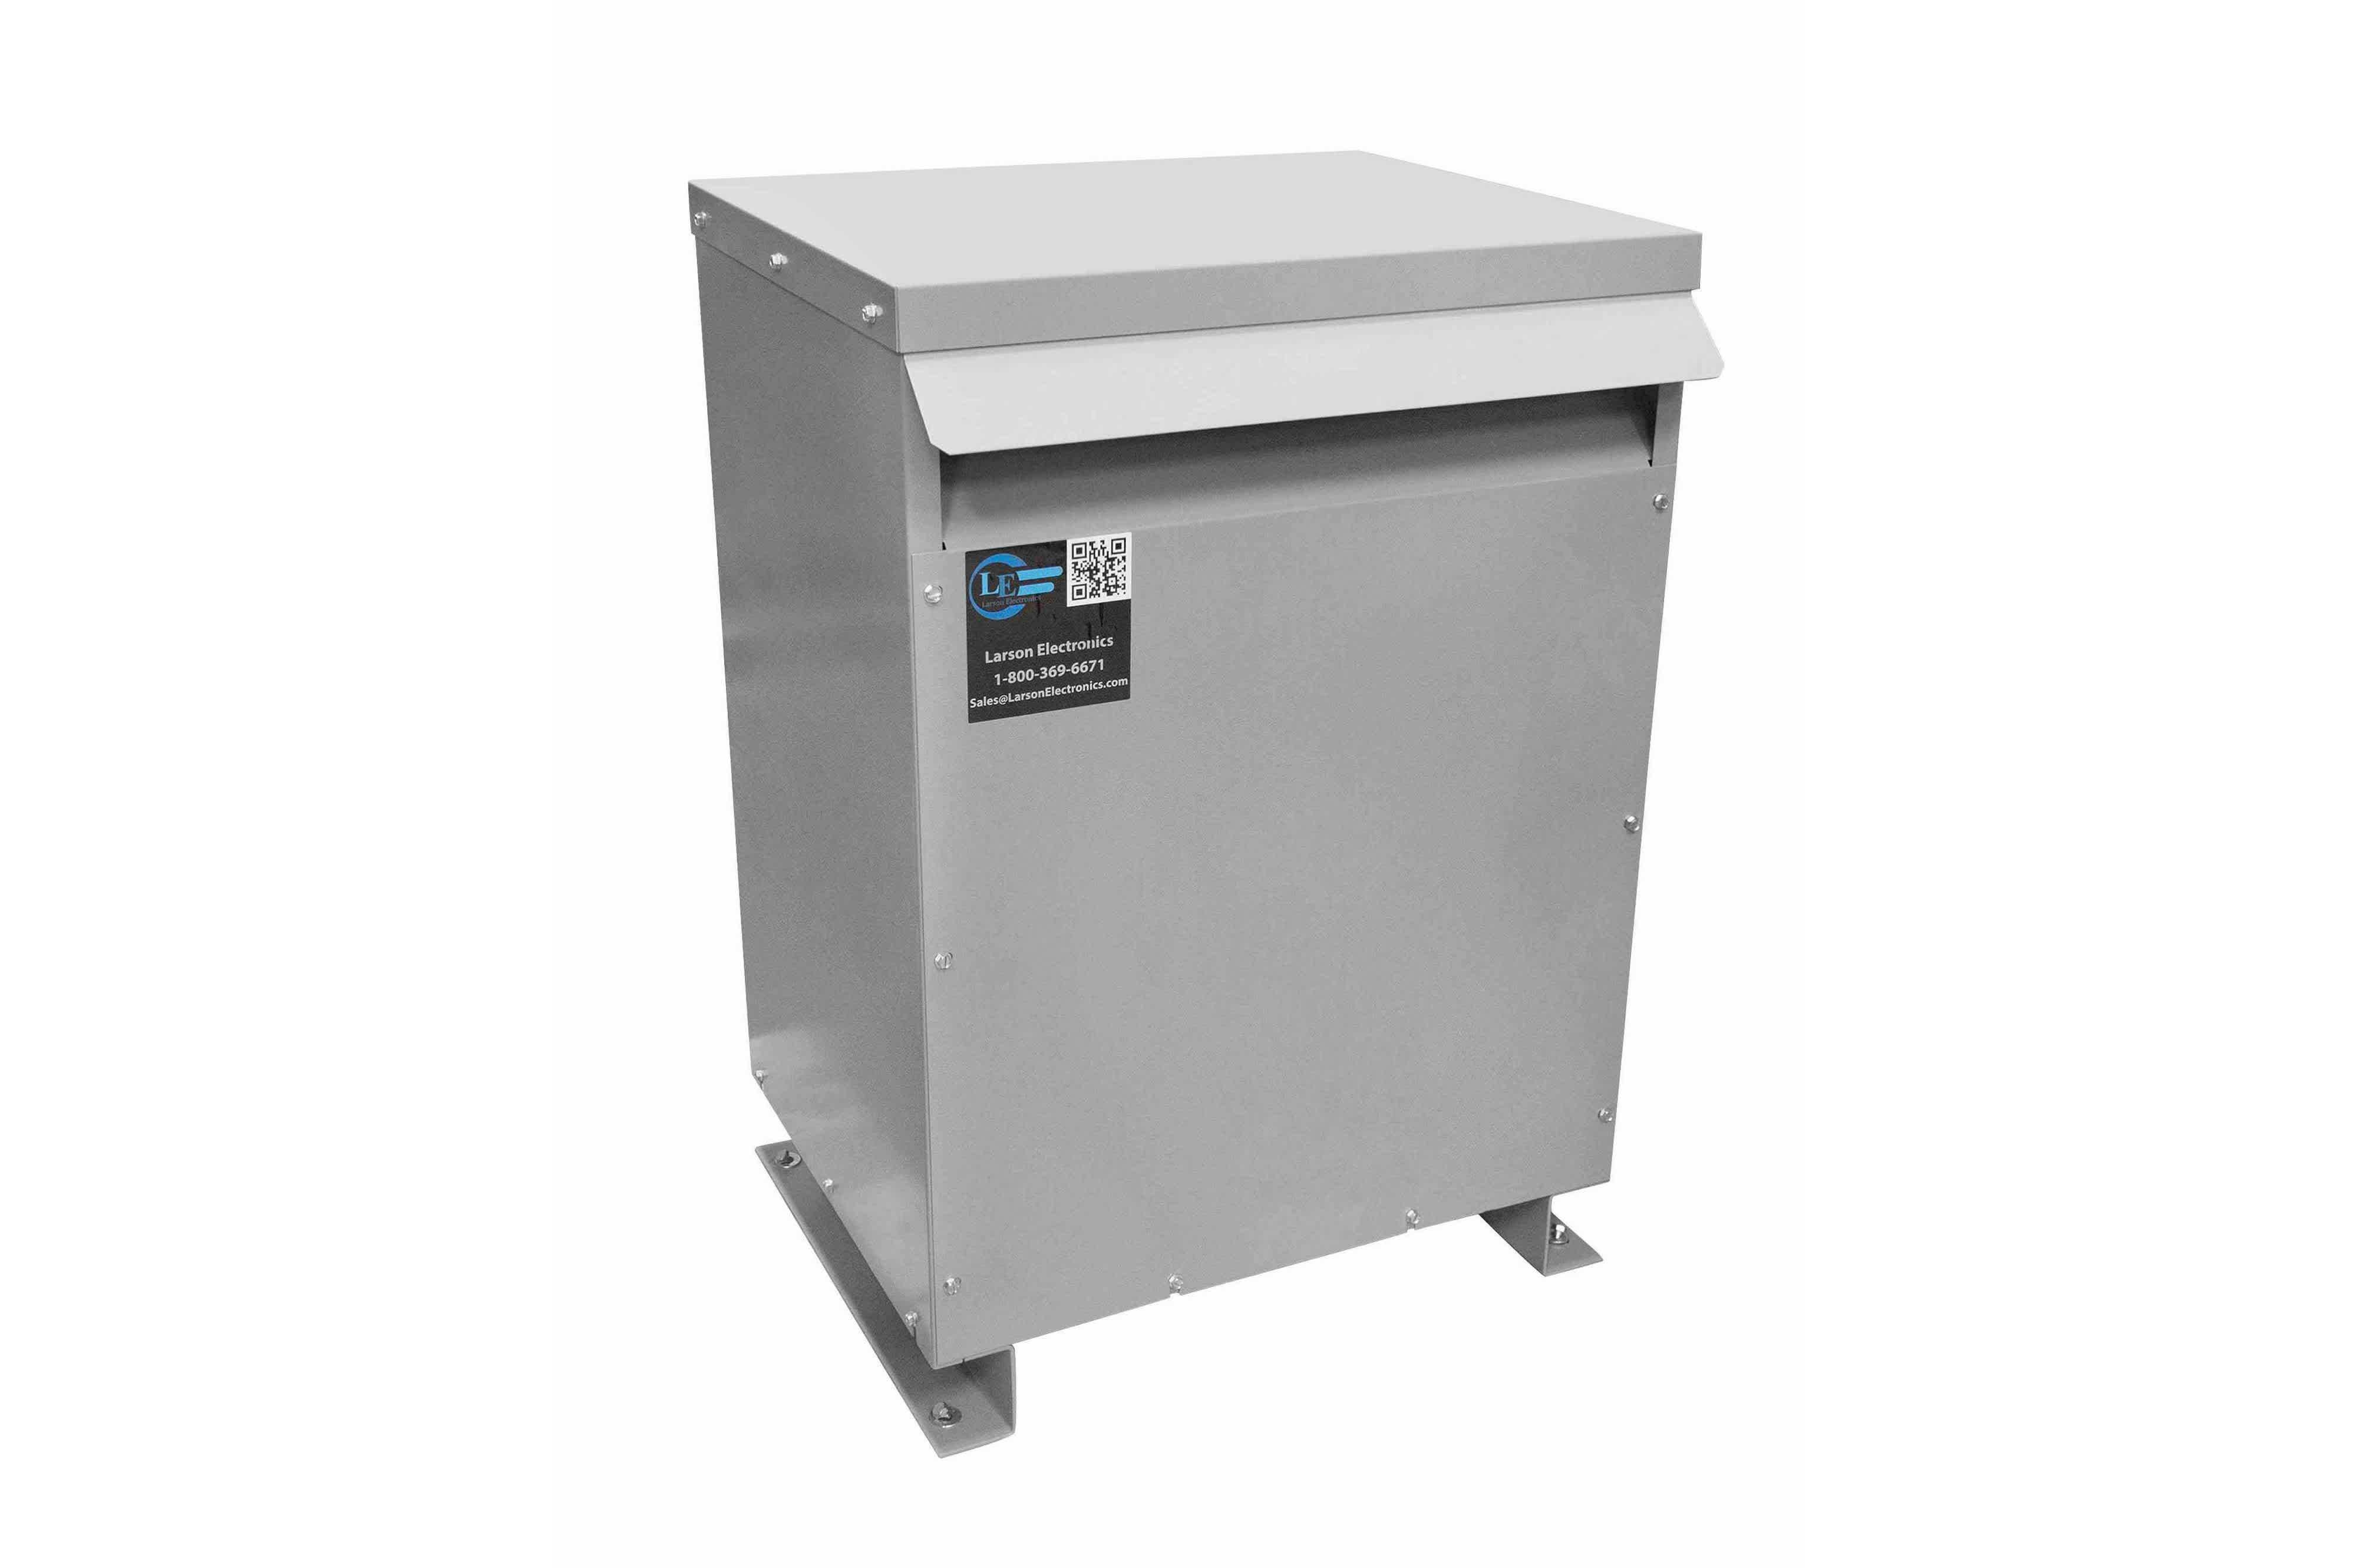 60 kVA 3PH Isolation Transformer, 415V Wye Primary, 240V/120 Delta Secondary, N3R, Ventilated, 60 Hz